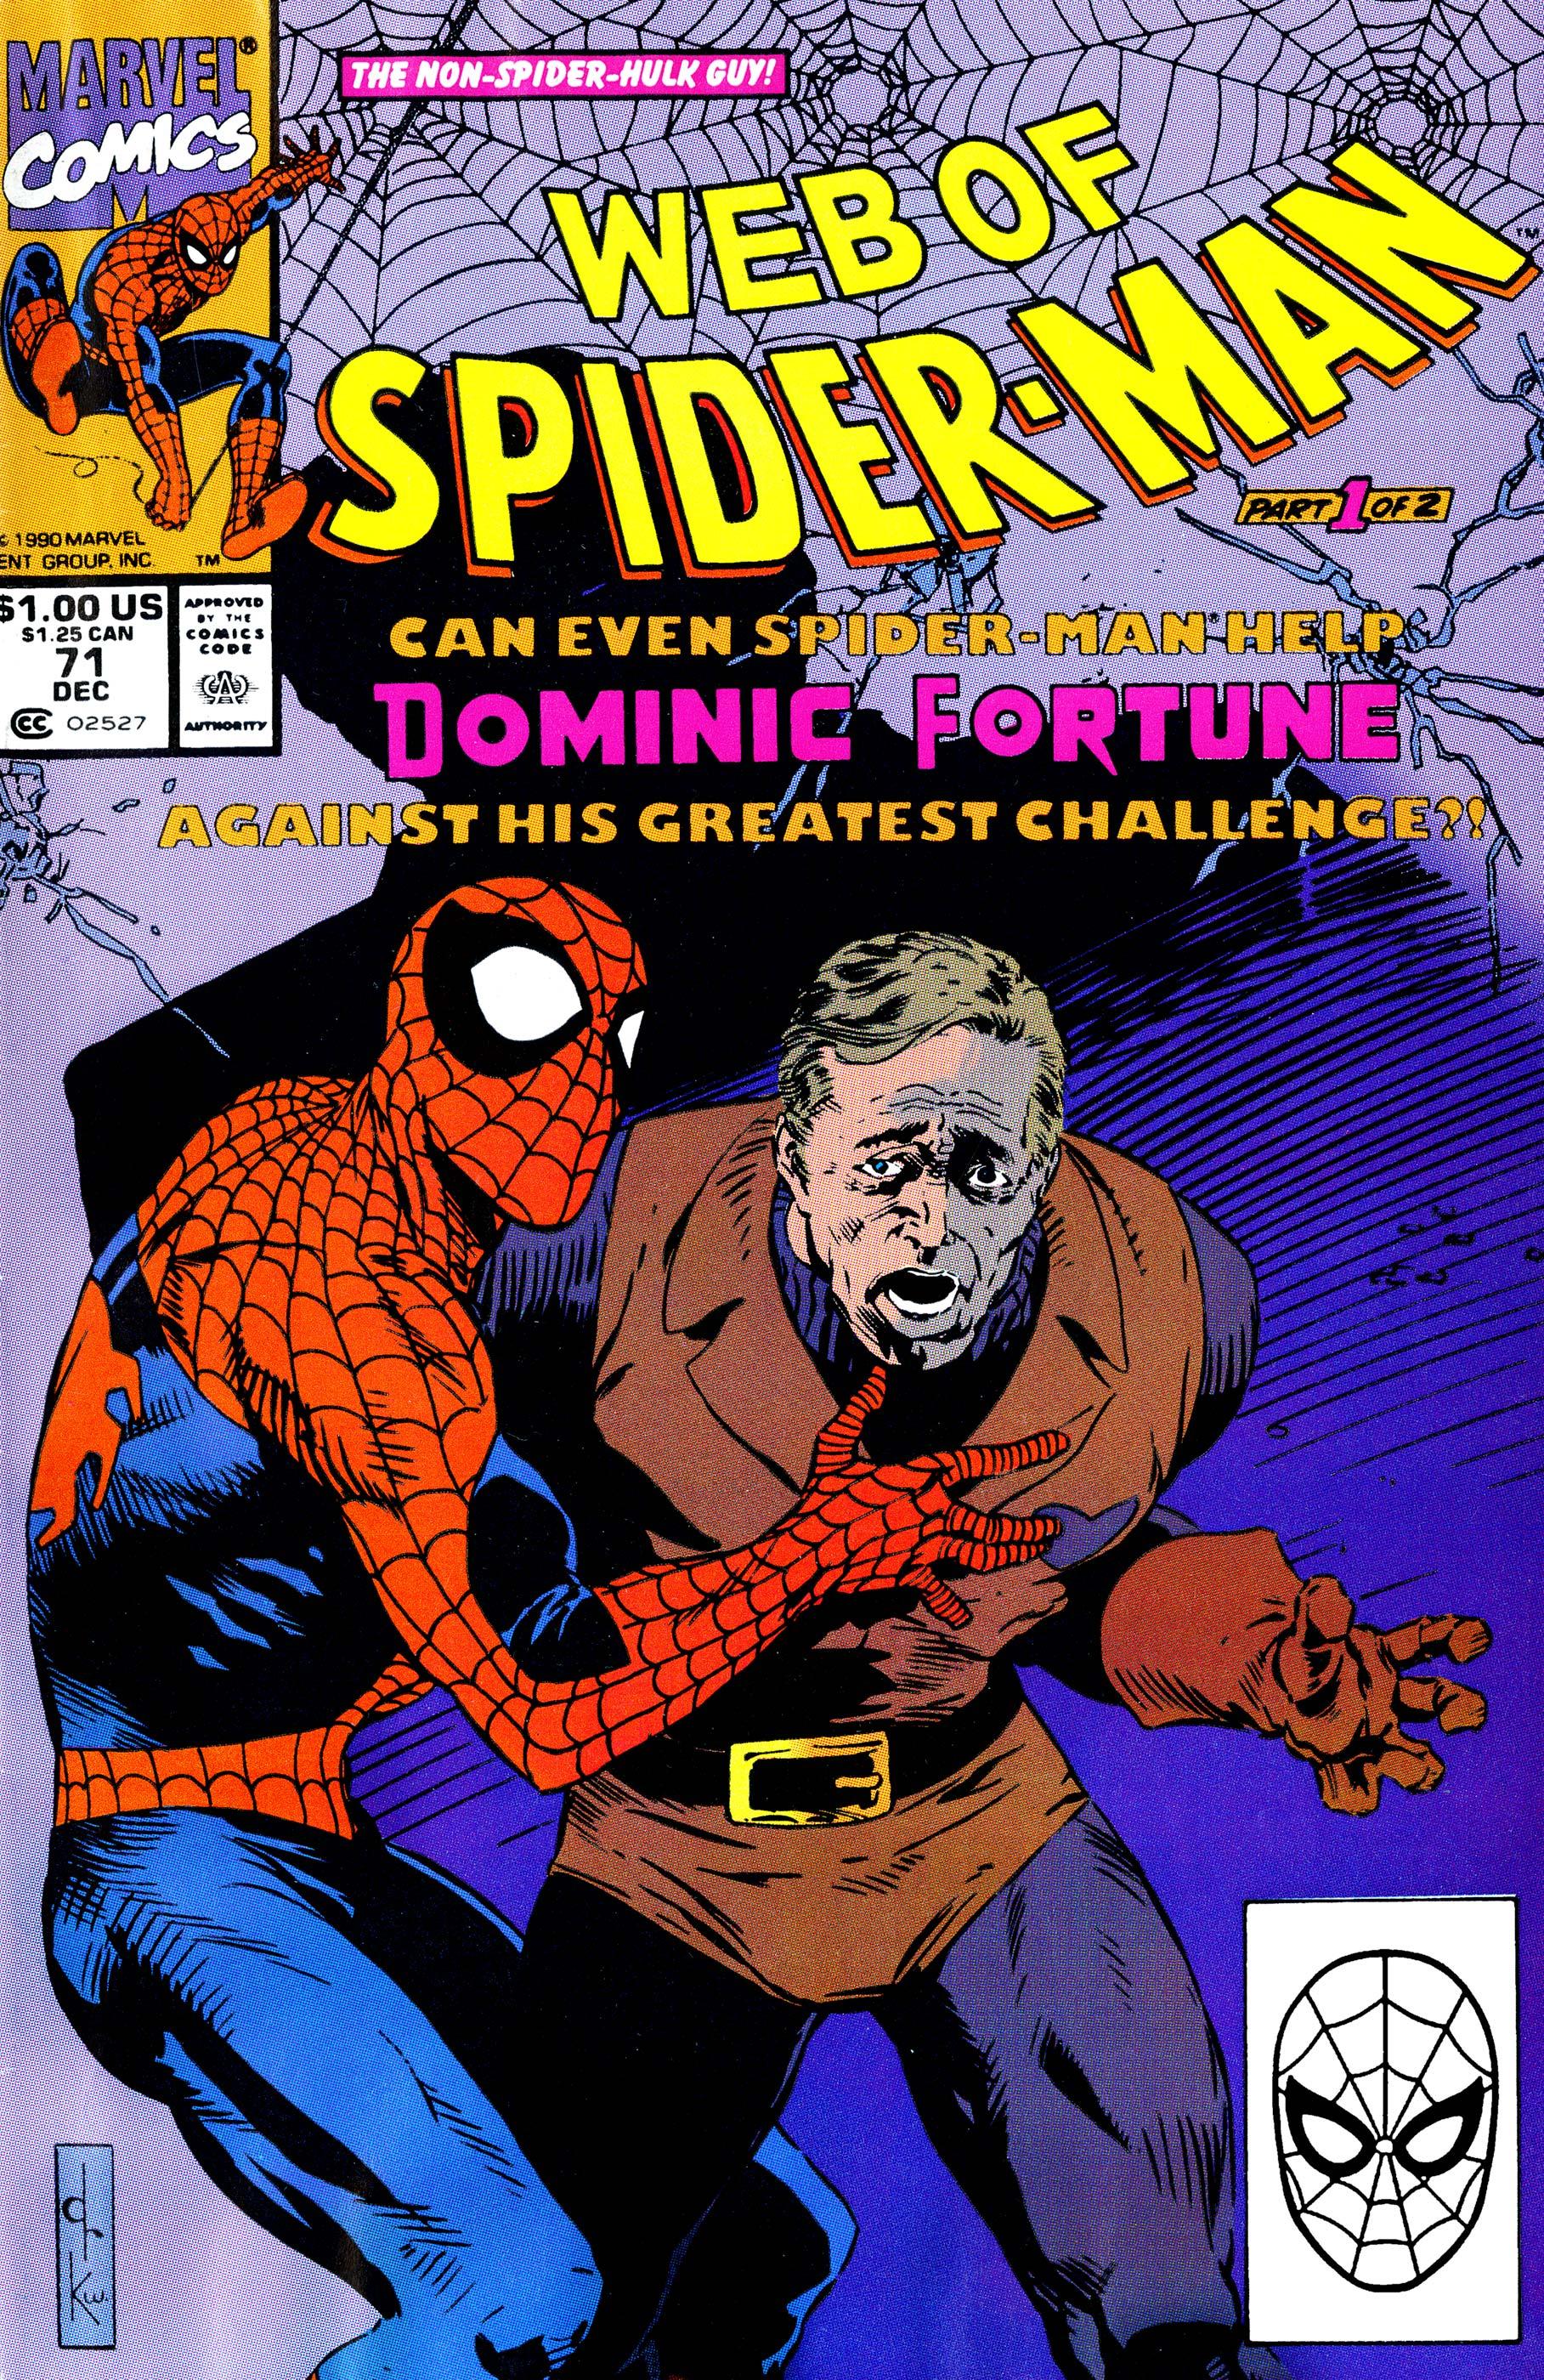 Web of Spider-Man (1985) #71